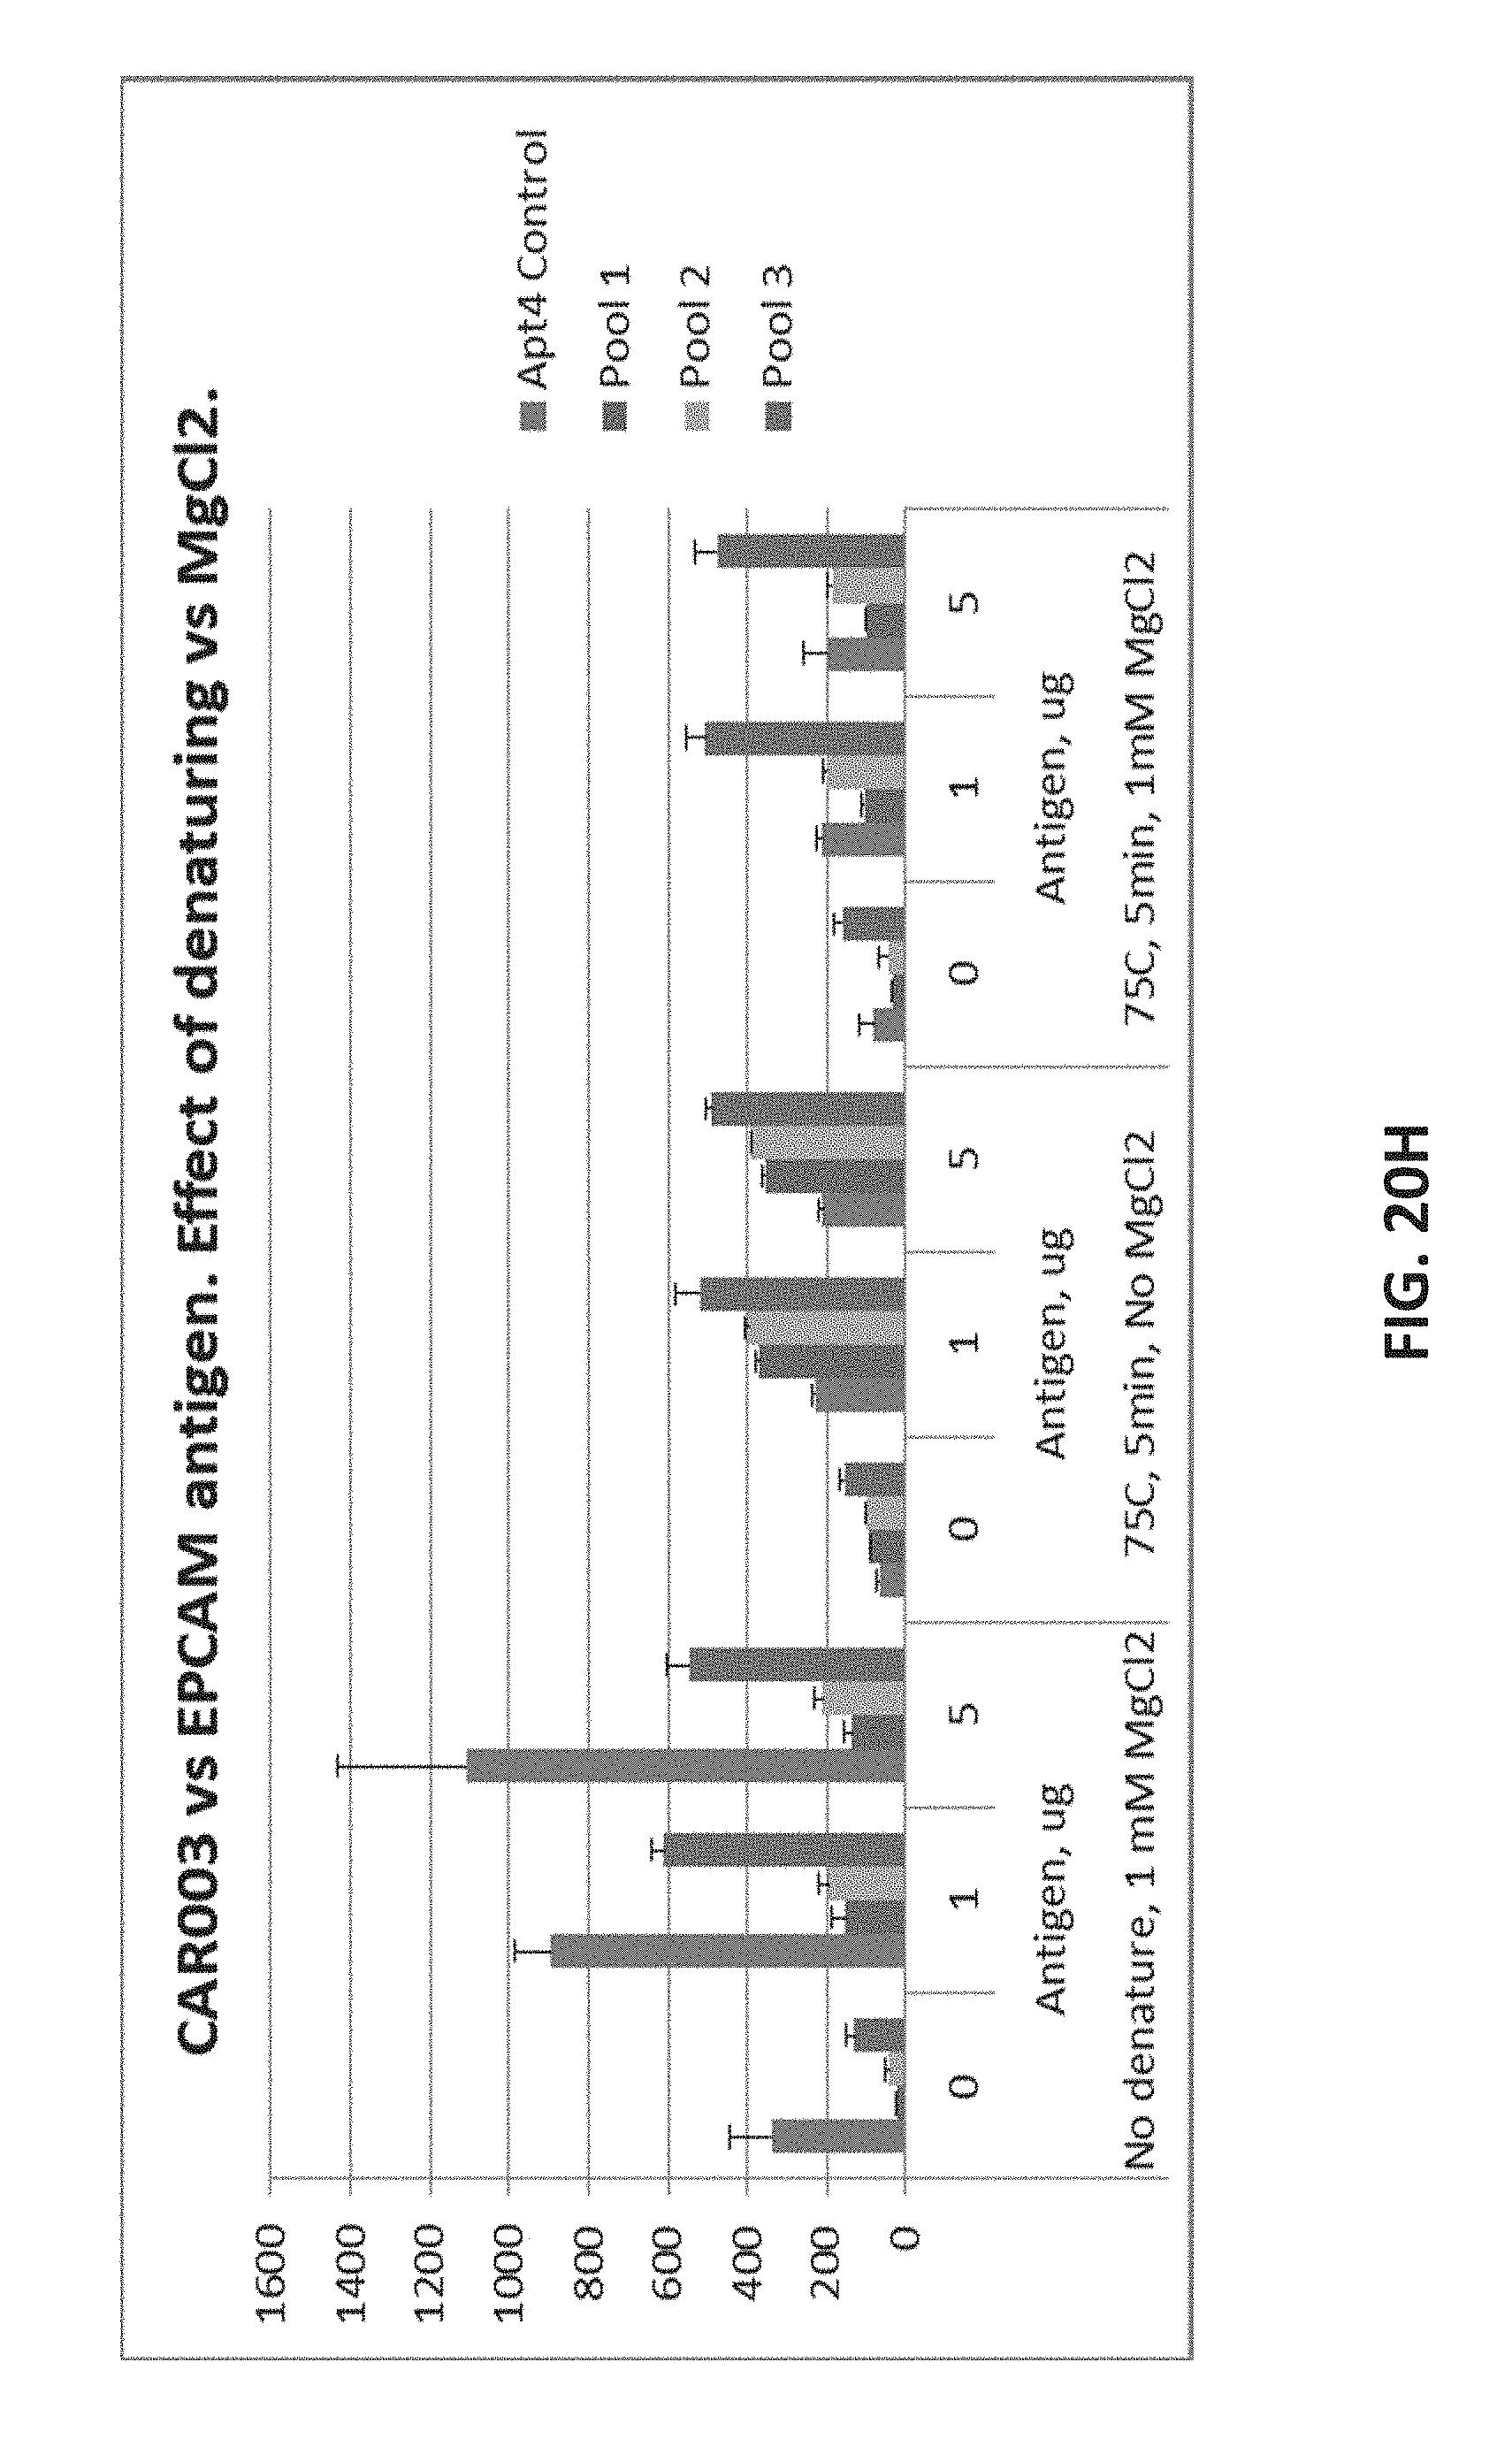 Patent US 9,958,448 B2